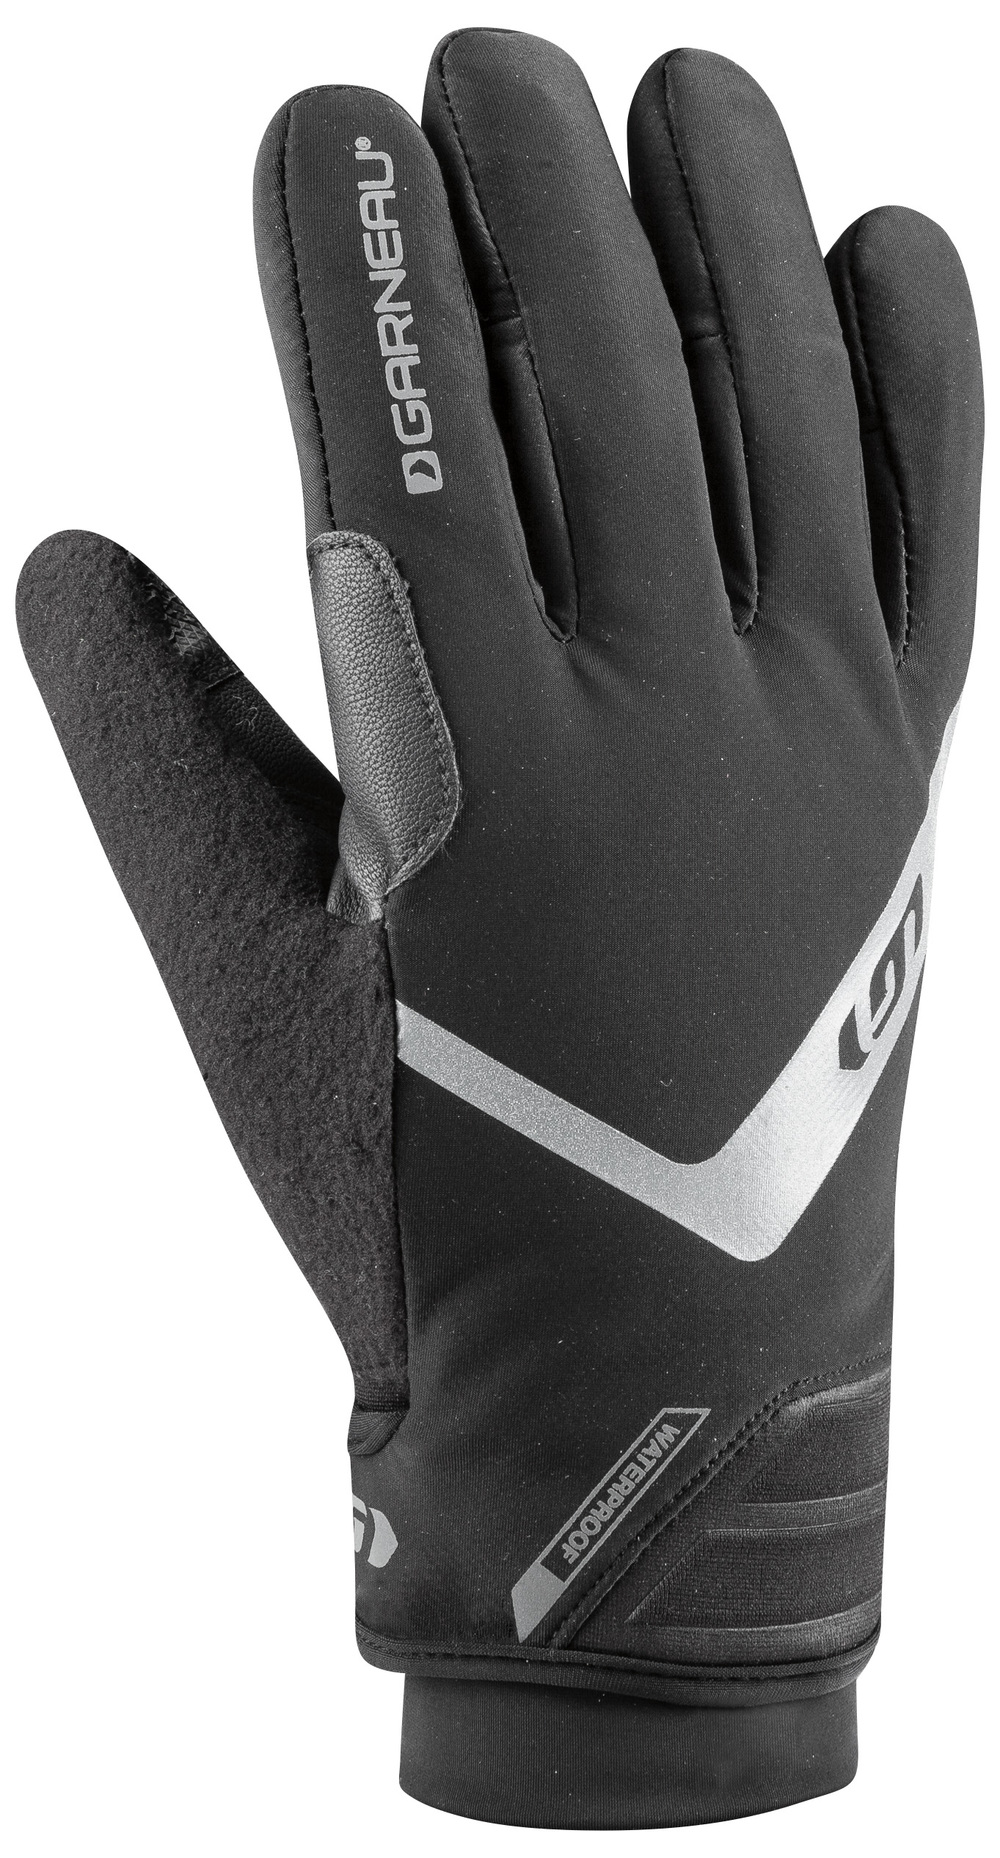 Louis Garneau Proof Gloves, $65